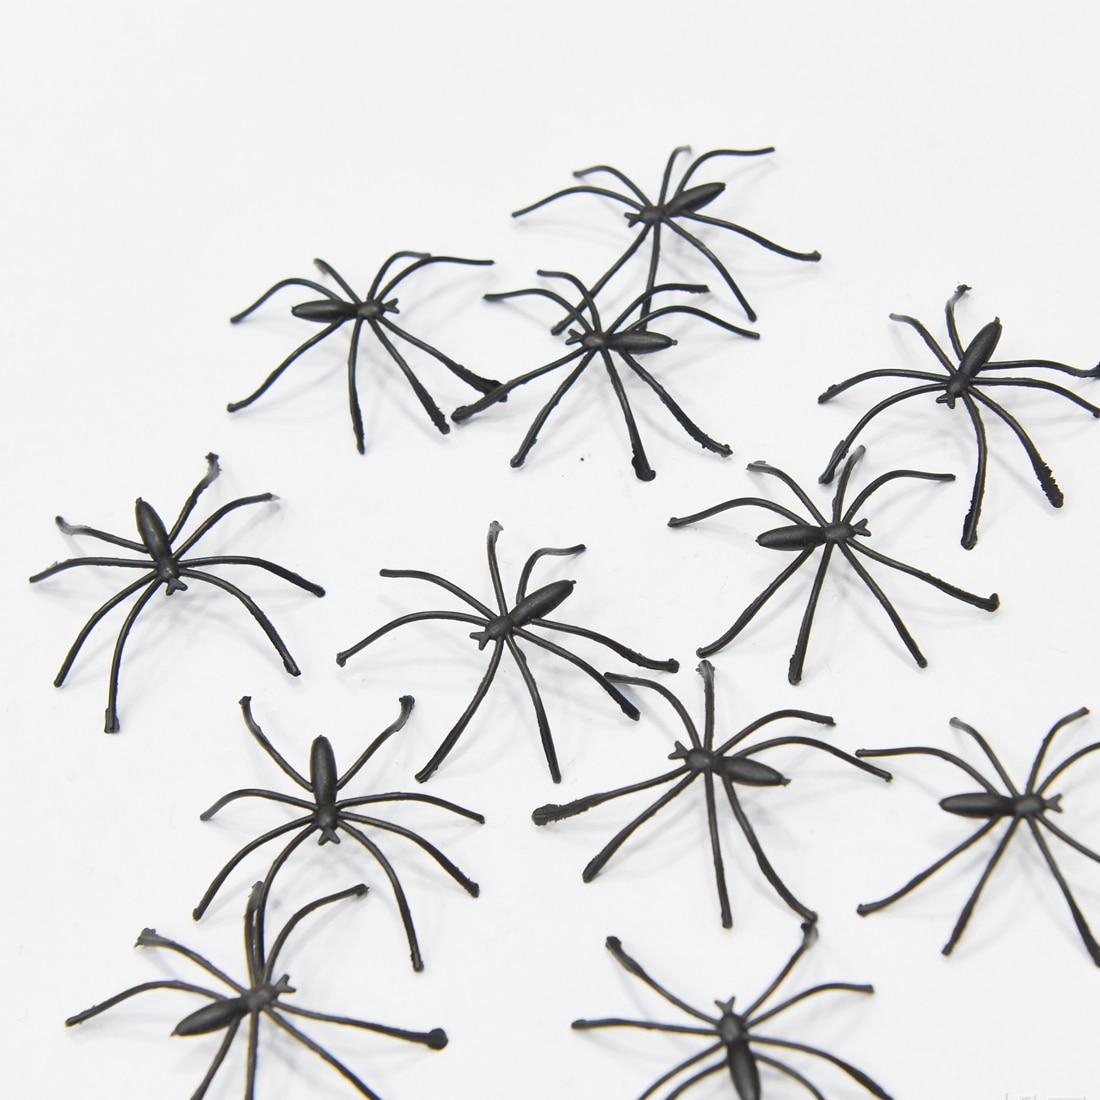 Decor Modern 20pcs 4cm Halloween Plastic Black Spider Realistic Prank Joking Toys home Decoration Cheap